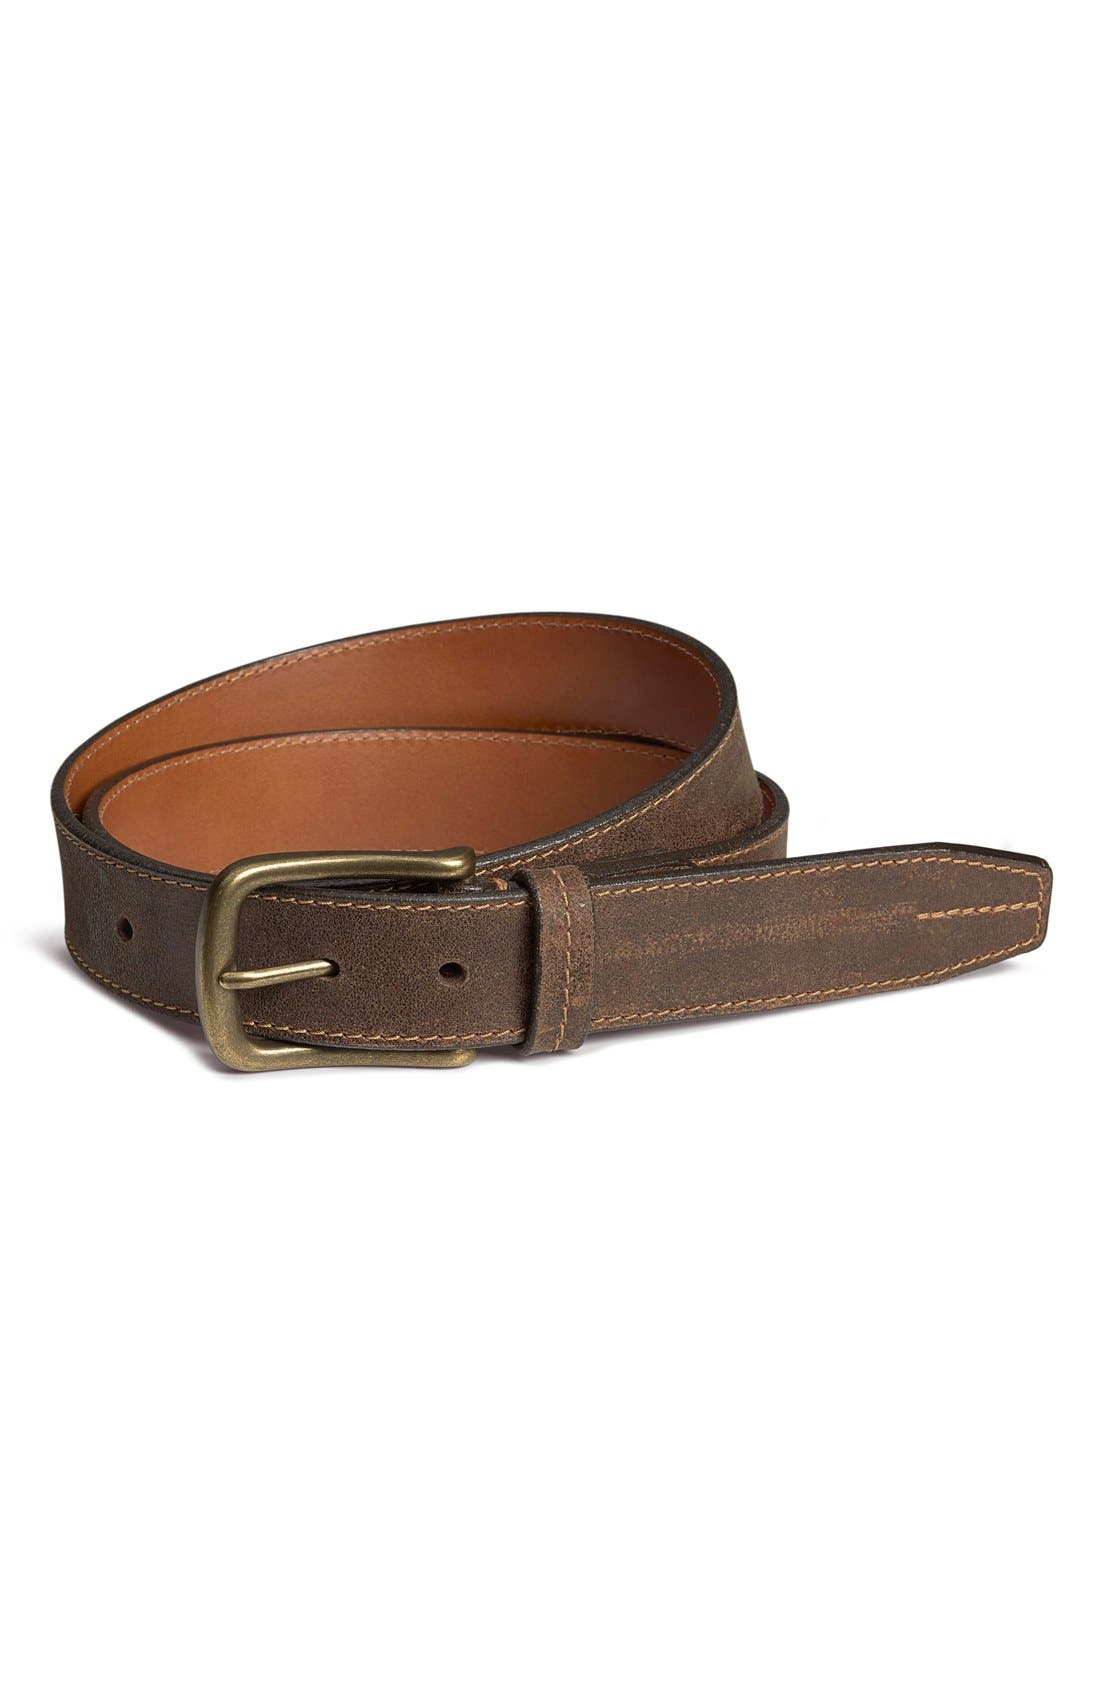 'Logan' Bison Leather Belt,                             Main thumbnail 1, color,                             WALNUT